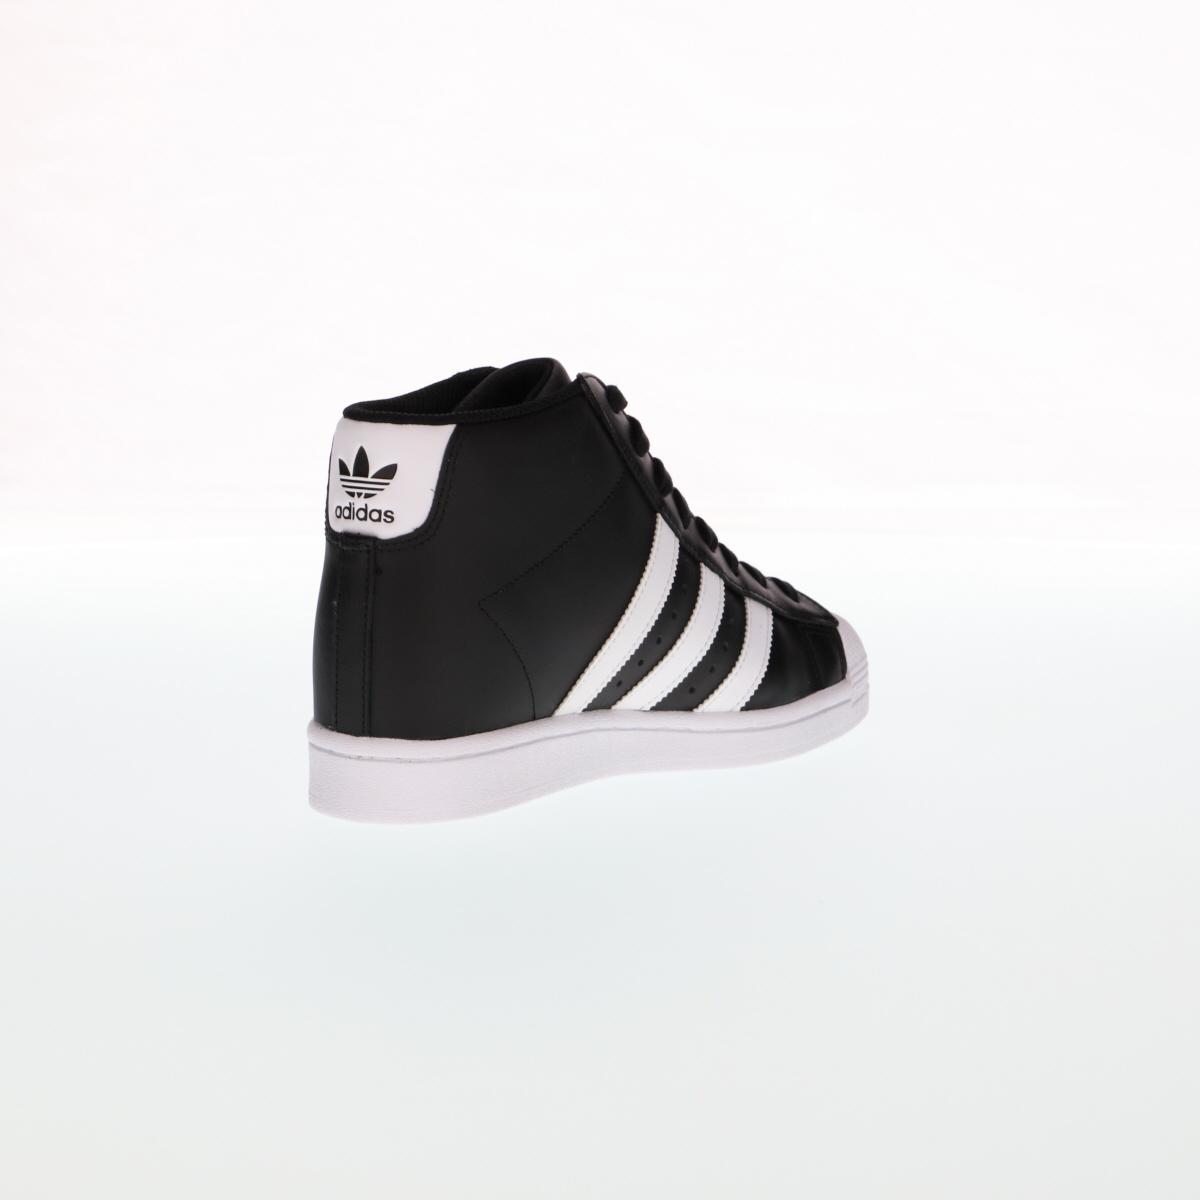 black and neon green nike turbo shox team shoes